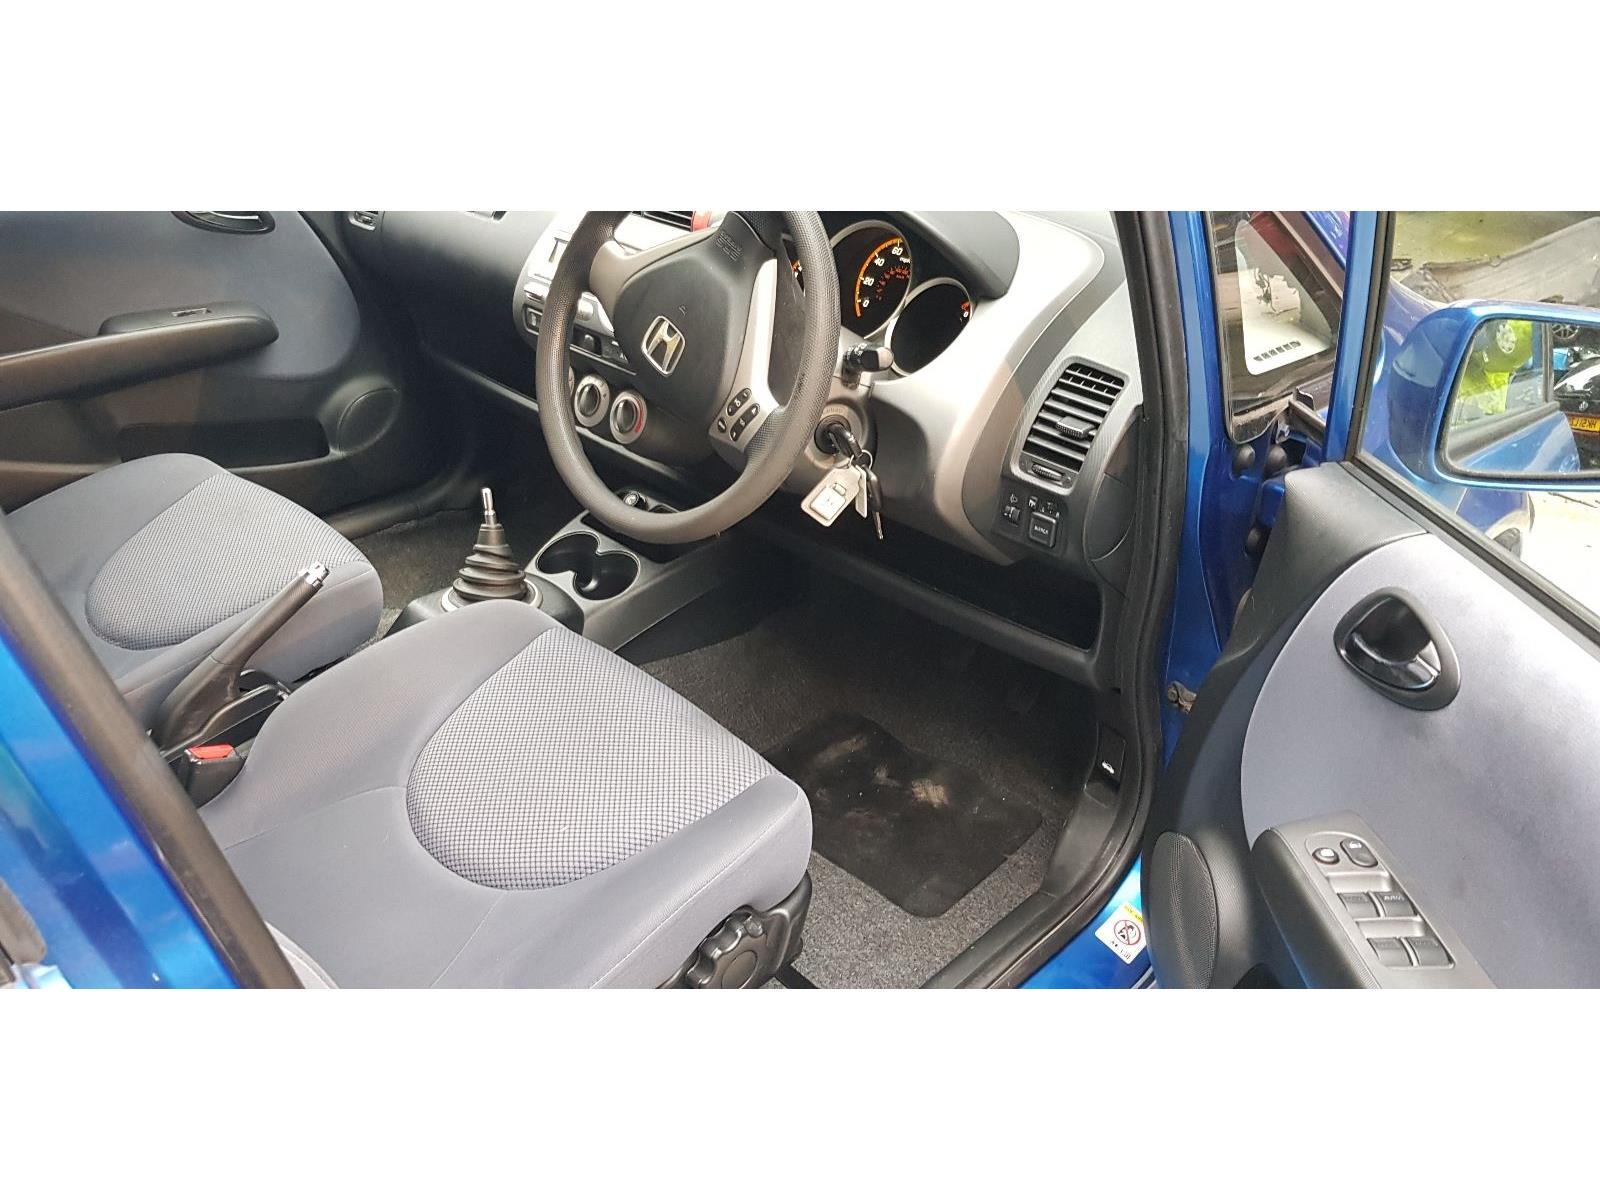 2005 Honda Jazz 2002 To 2004 Se 1 4l Manual Petrol Blue